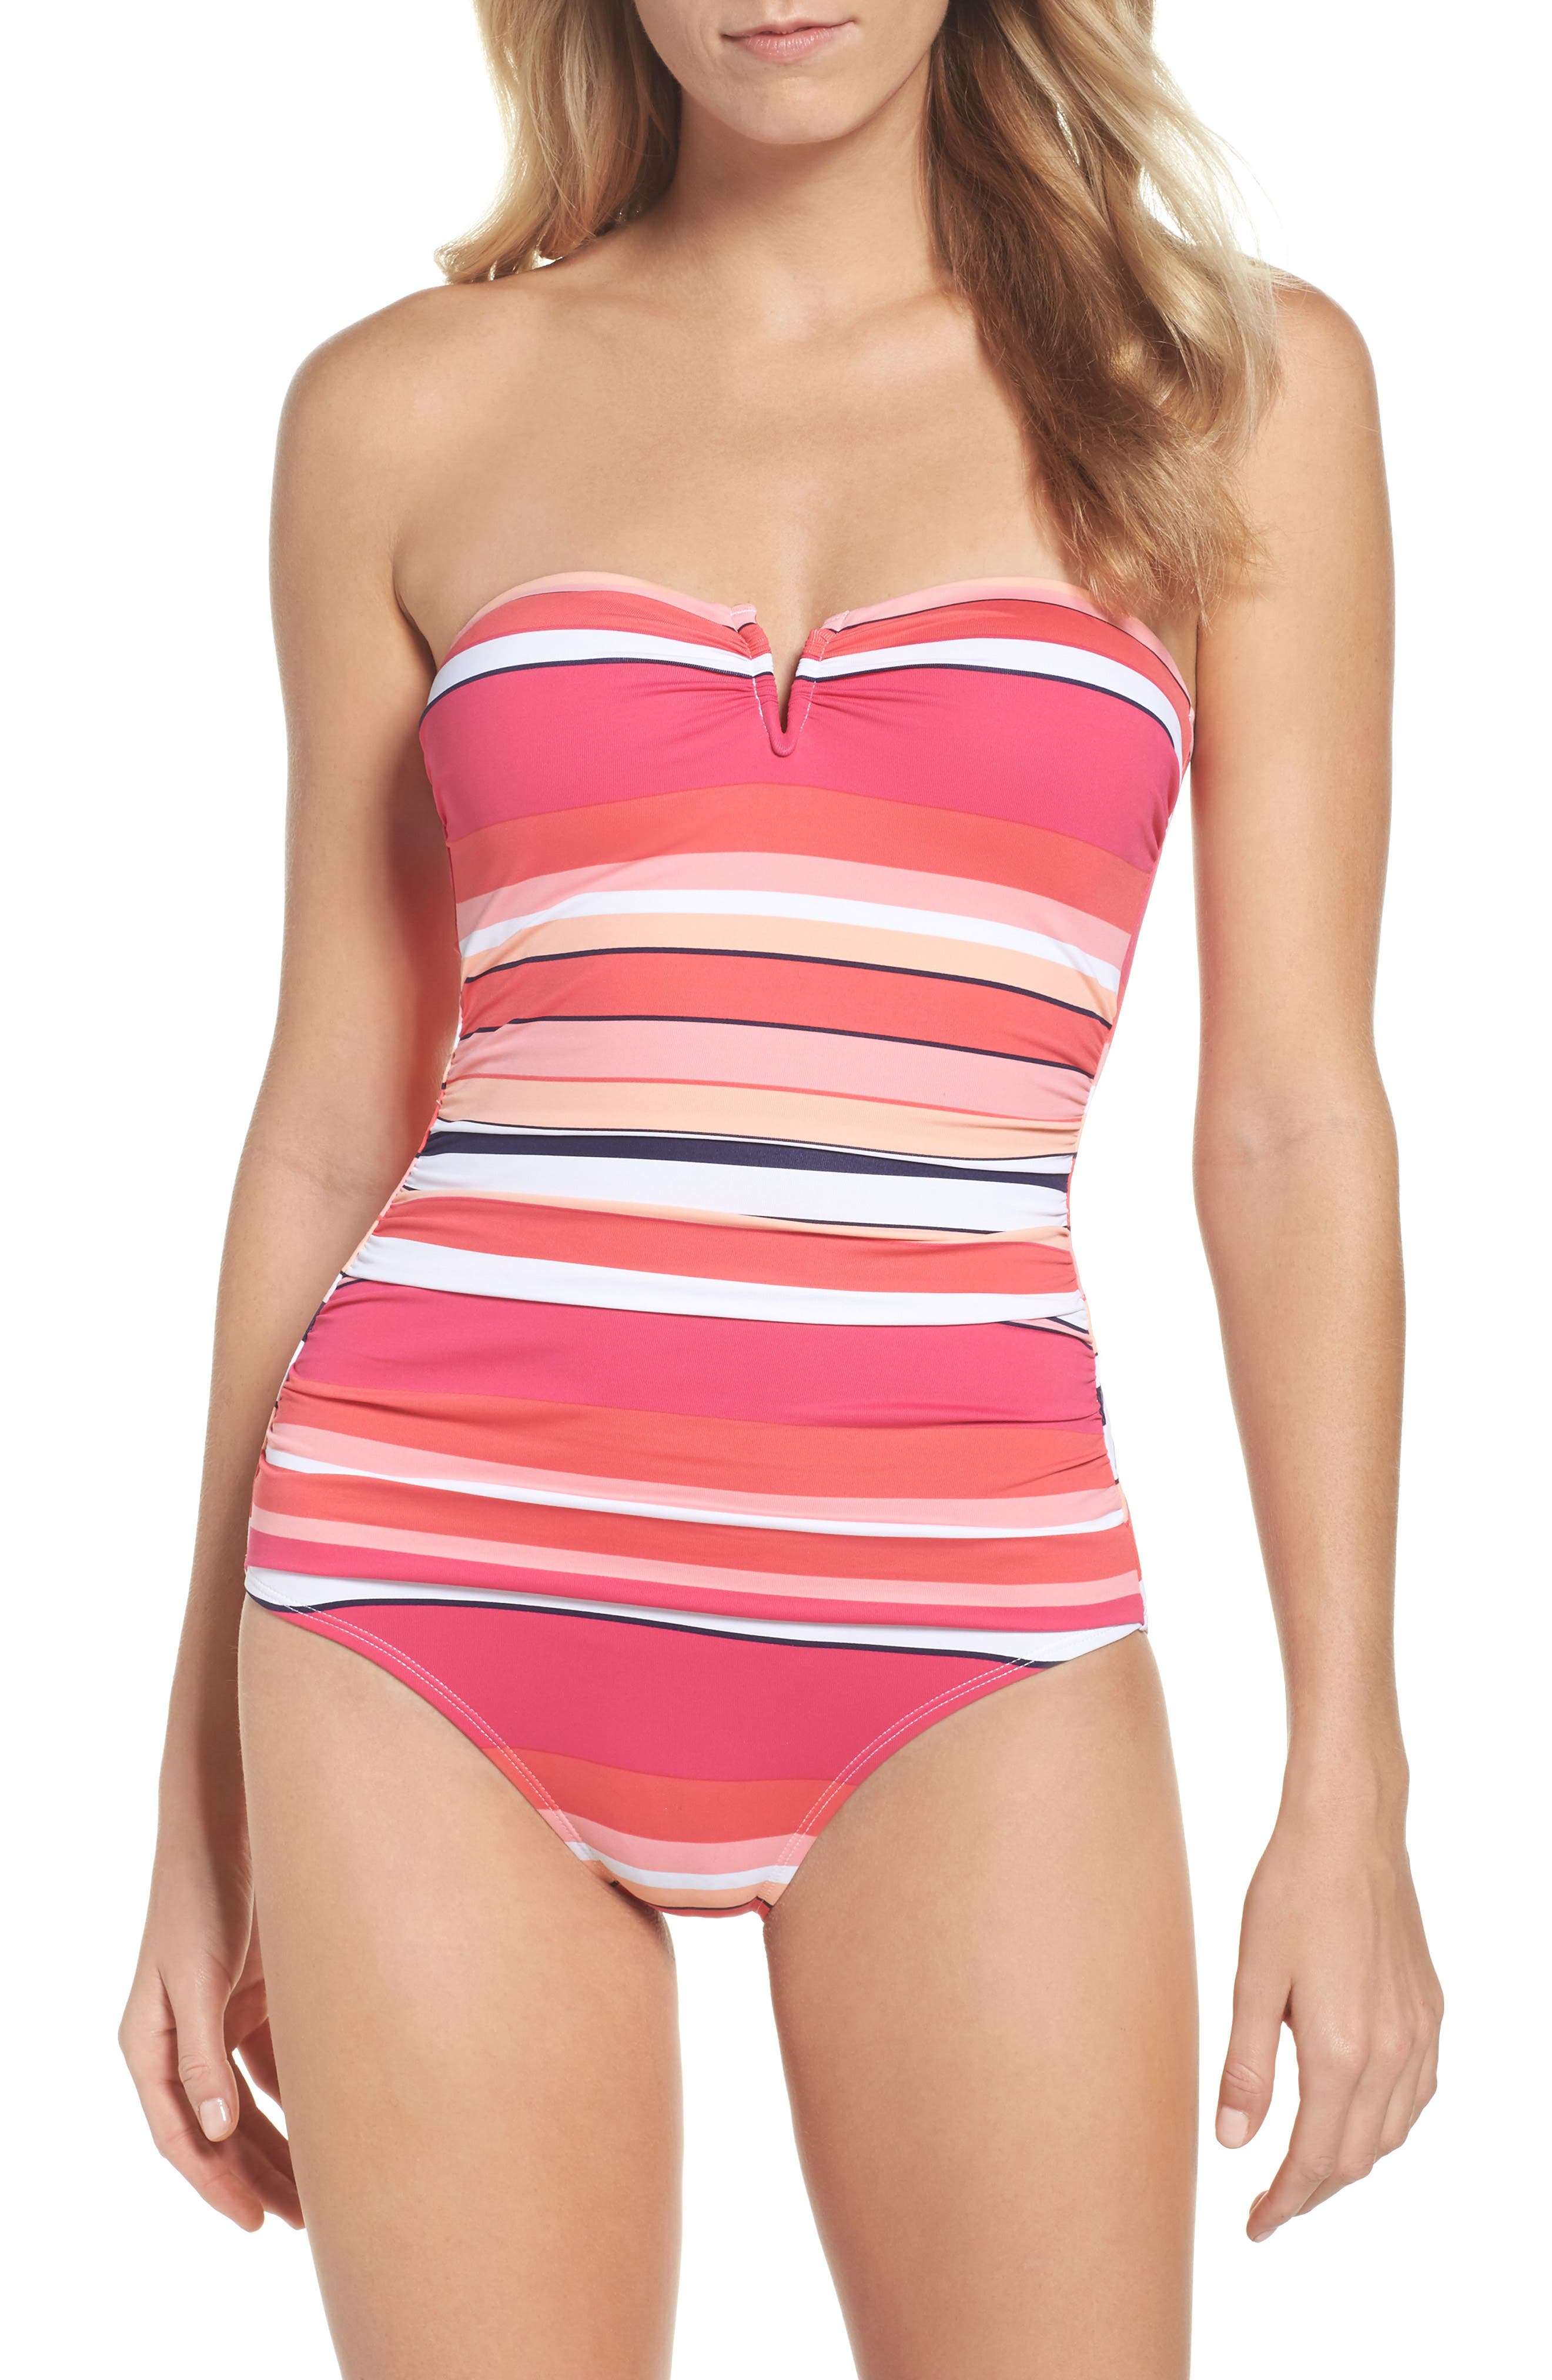 Petals of Paradise One-Piece Swimsuit,                         Main,                         color, 950